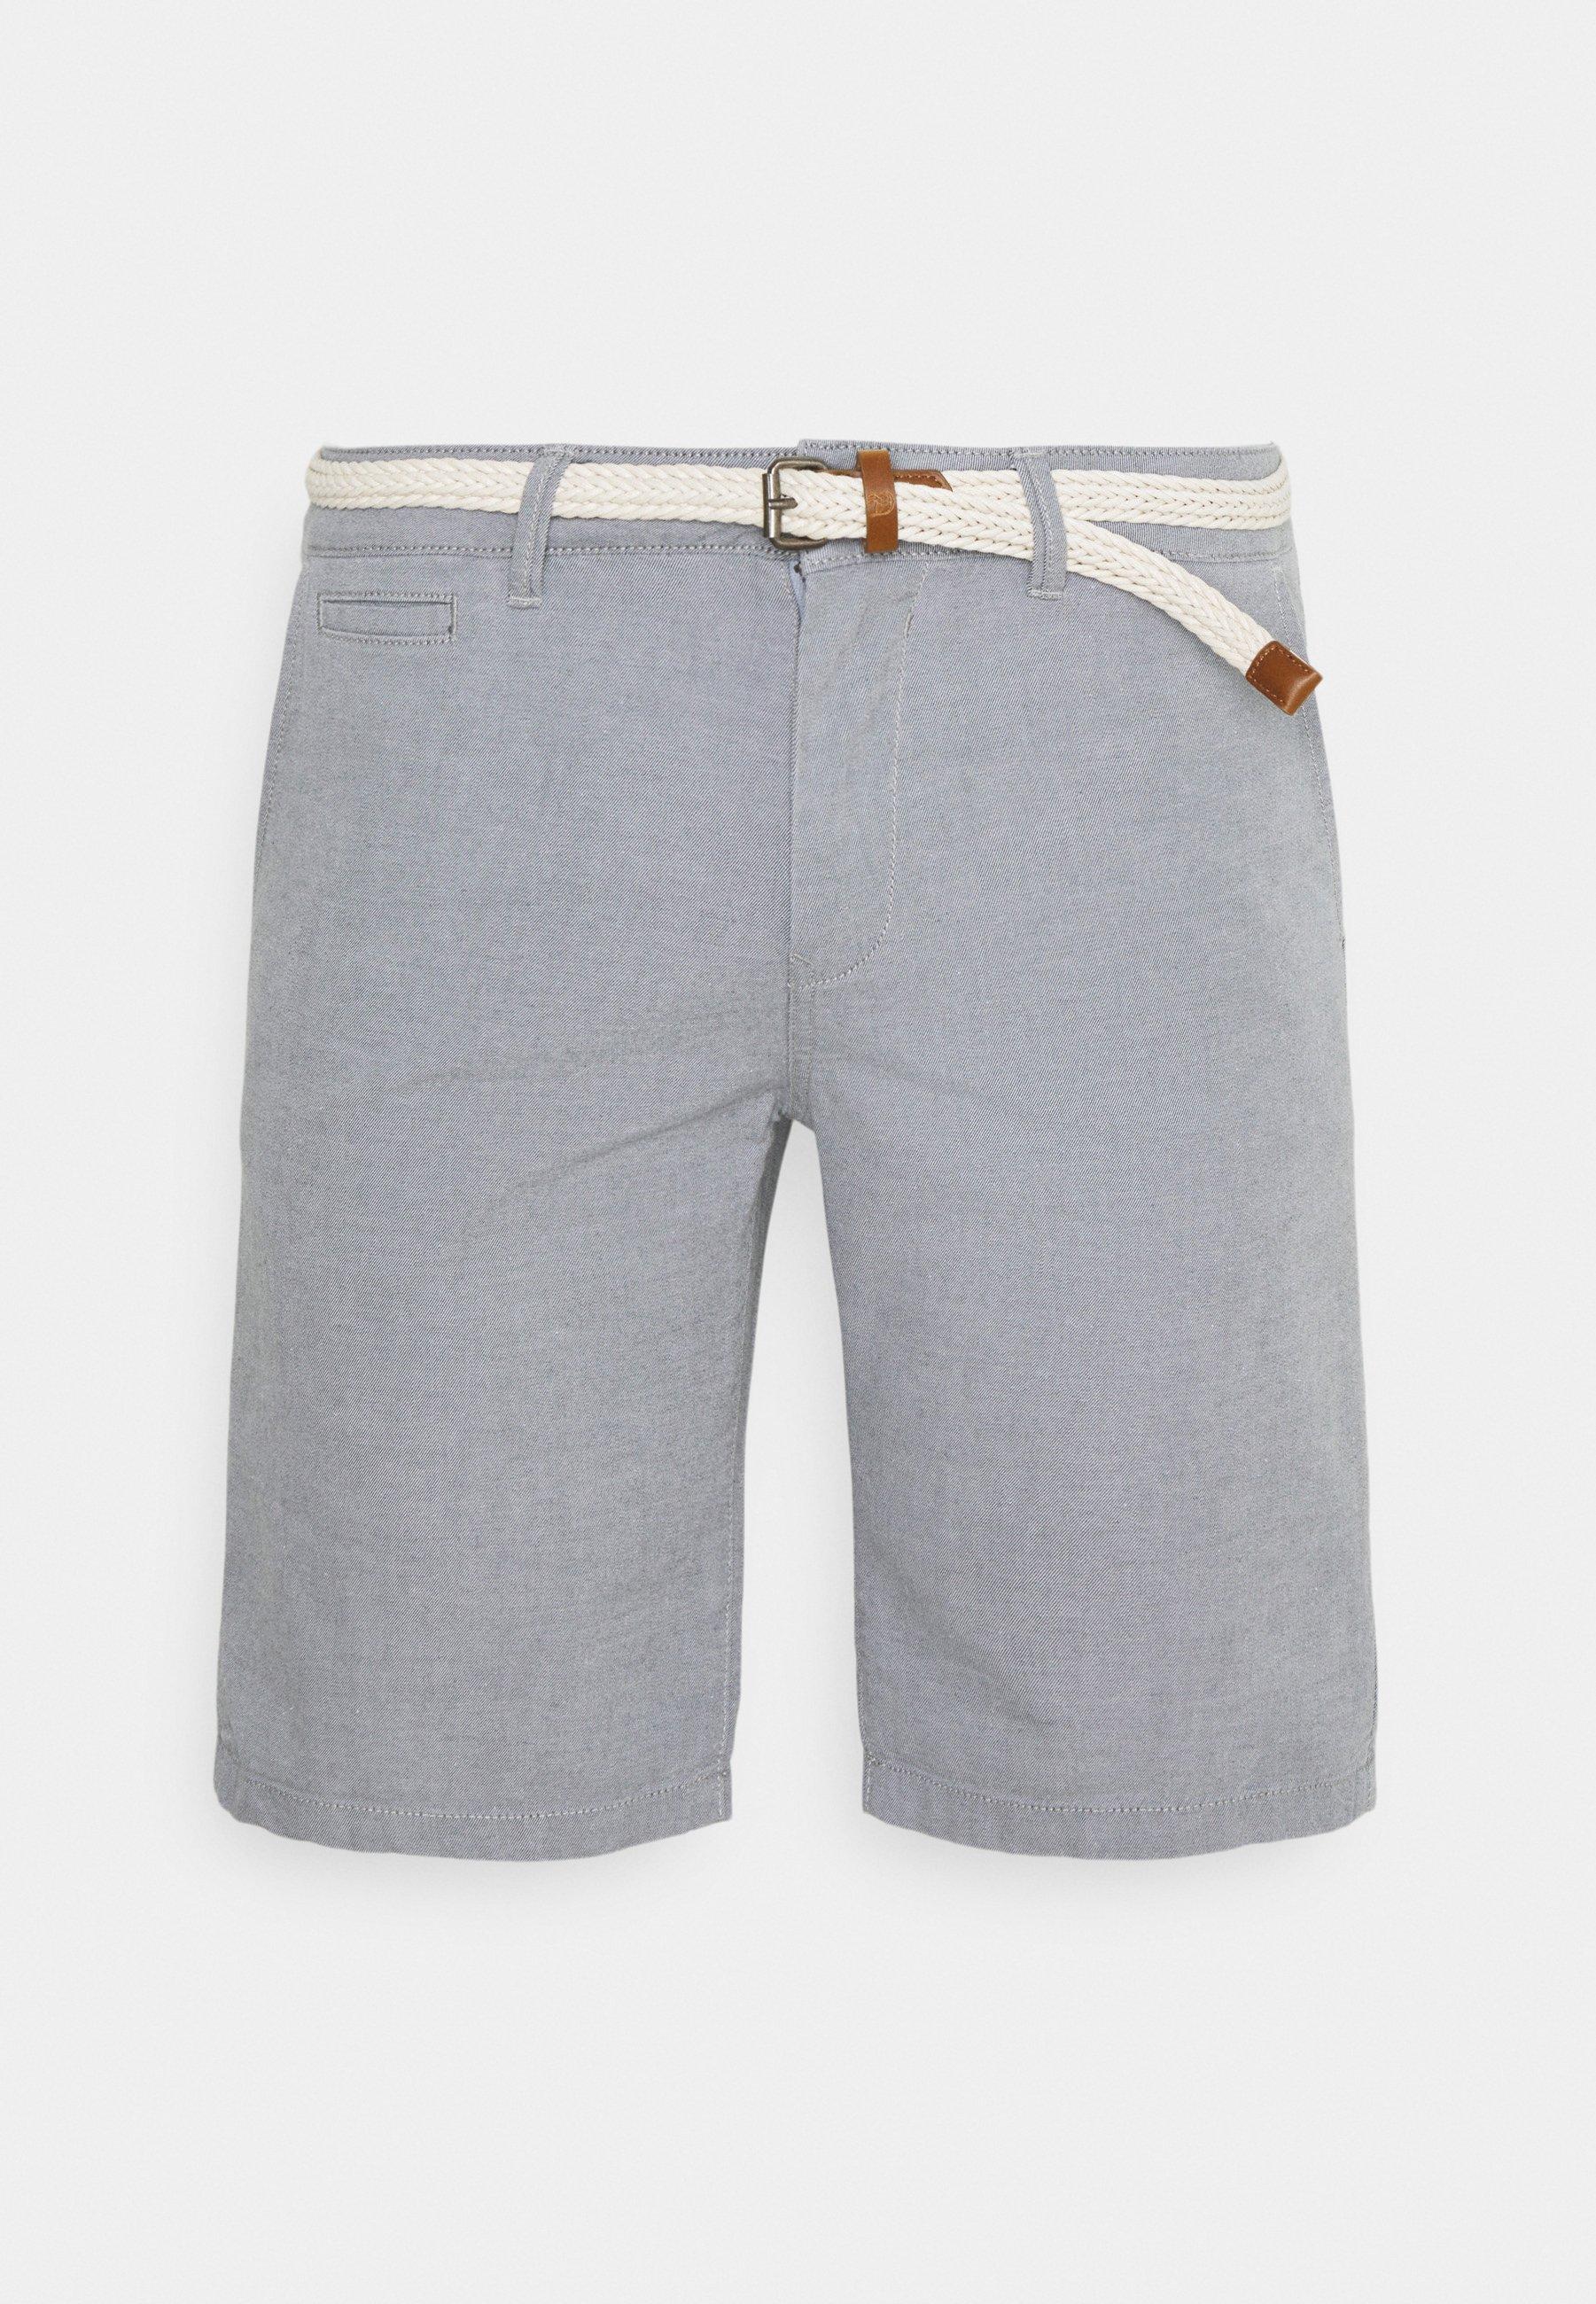 Homme WITH BELT - Short - medium grey